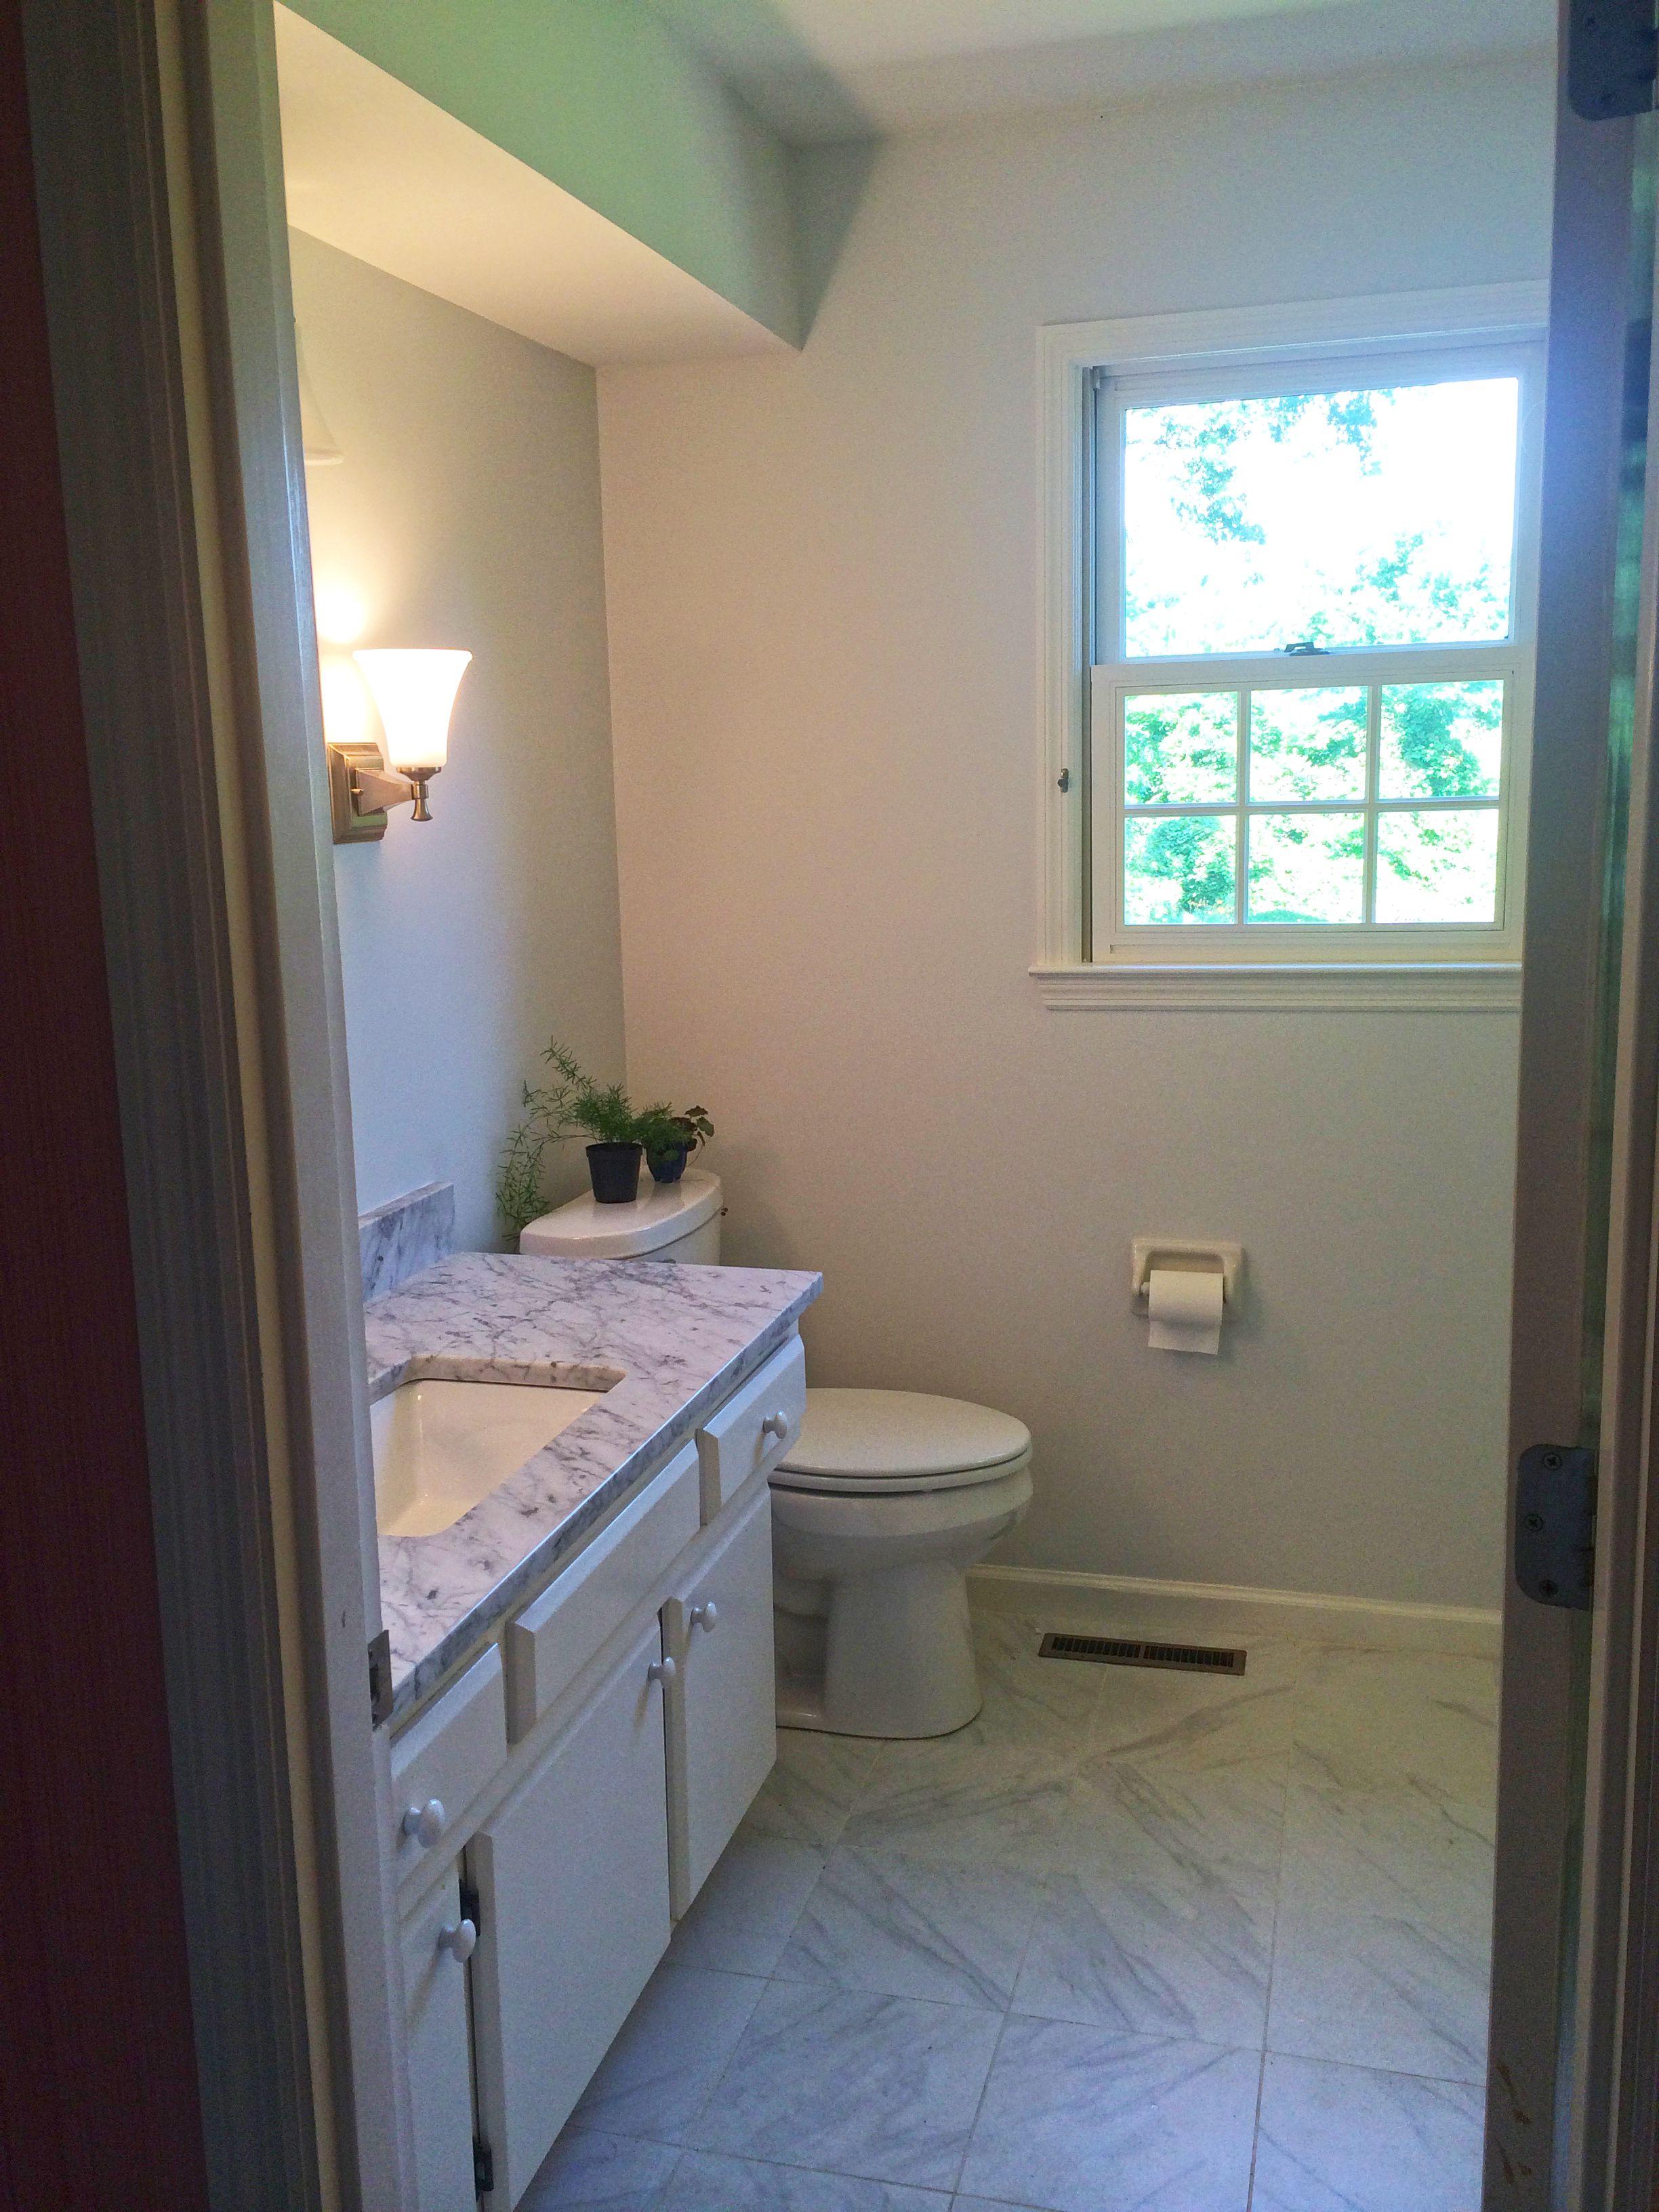 Bathroom Renovation - Daltile Carrara ceramic floor tile, White Carrara Granite countertop, undermount sink, Delta Faucet & Progress sconces and overhead lighting